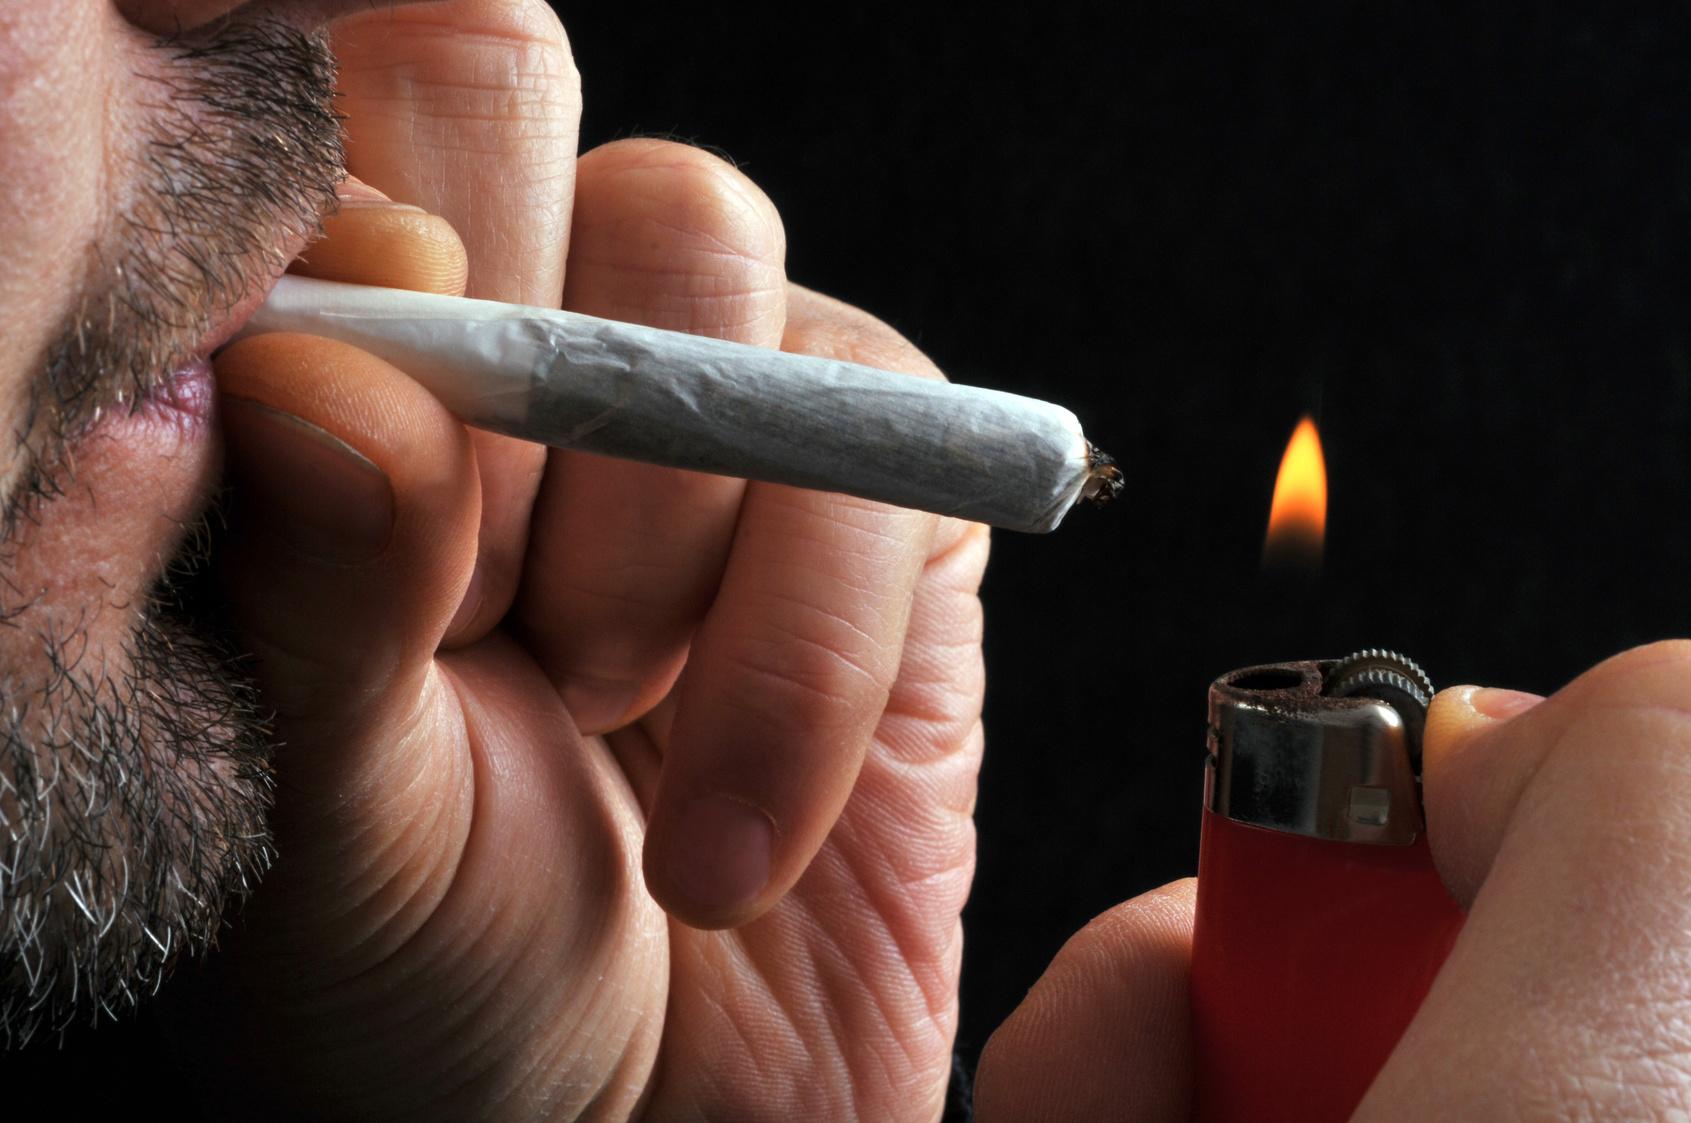 Joint anzünden